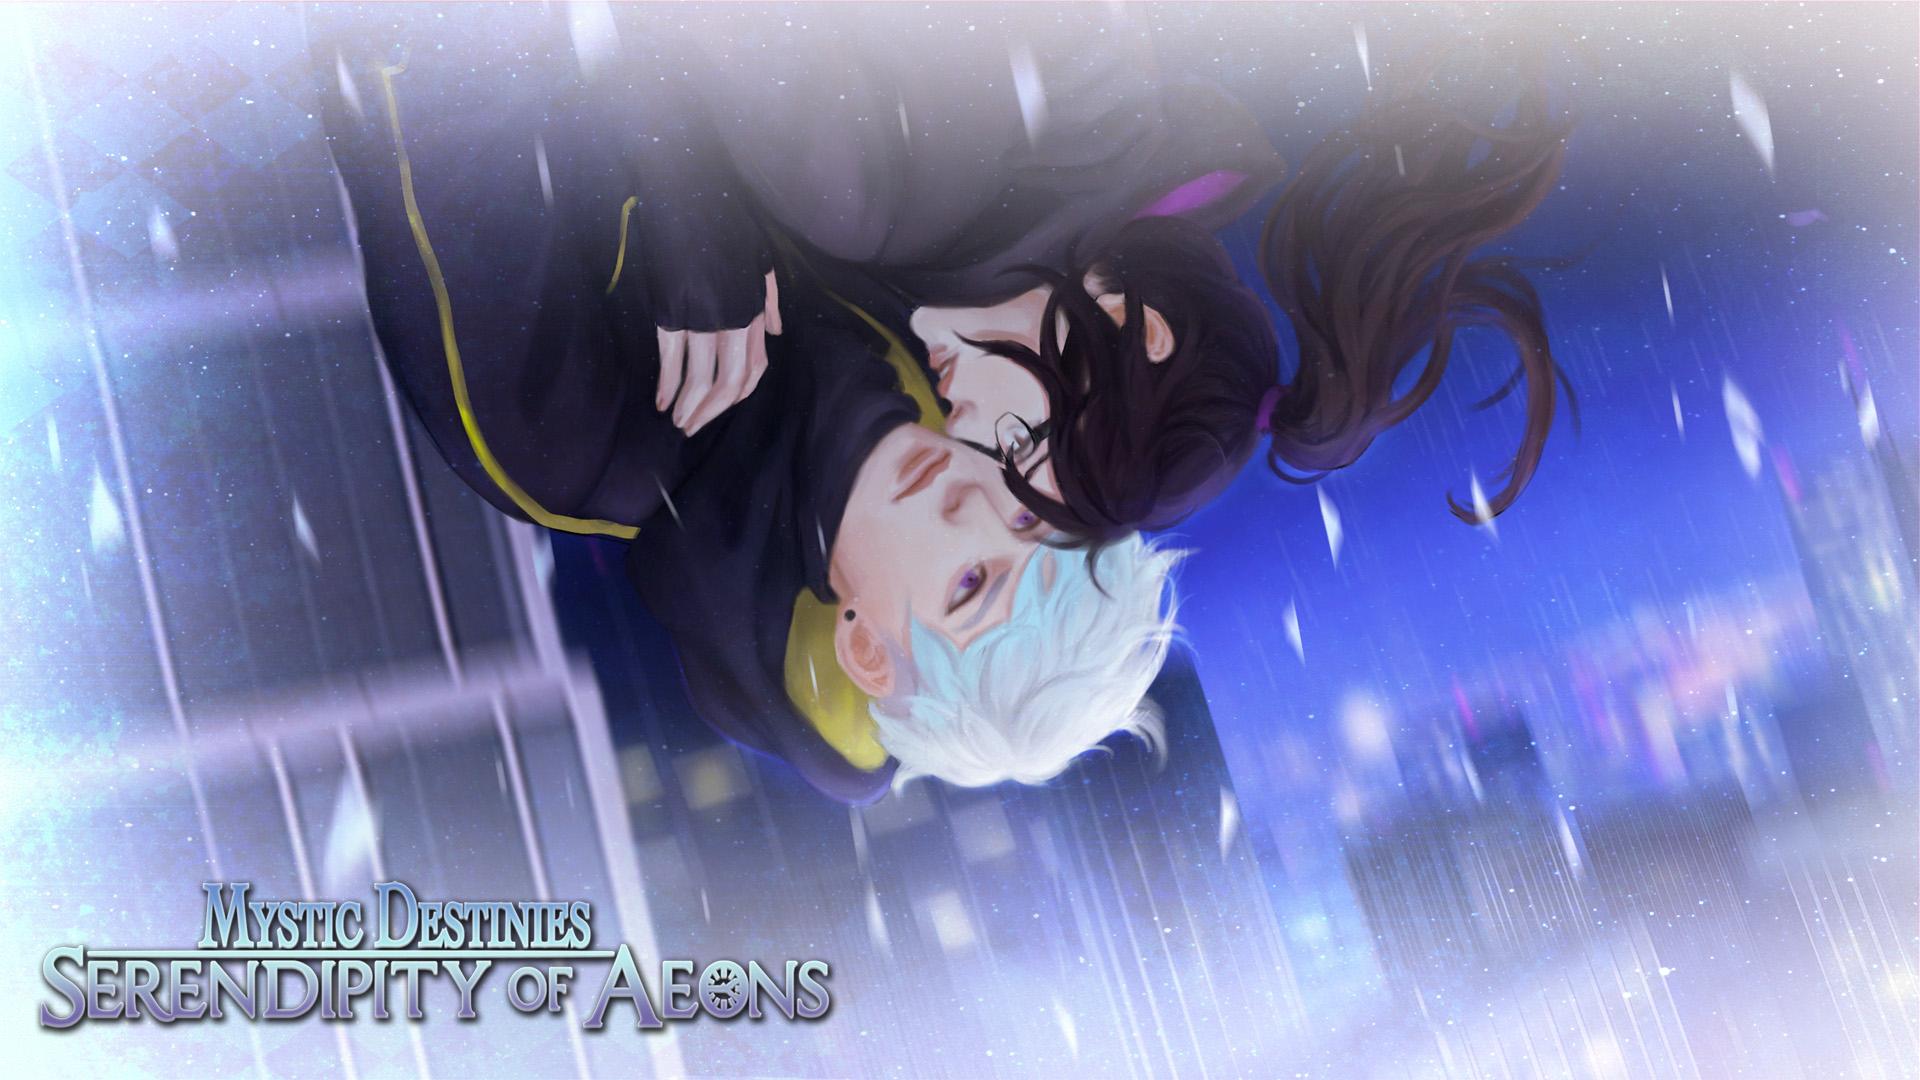 Mystic Destinies: Serendipity of Aeons - Takumi